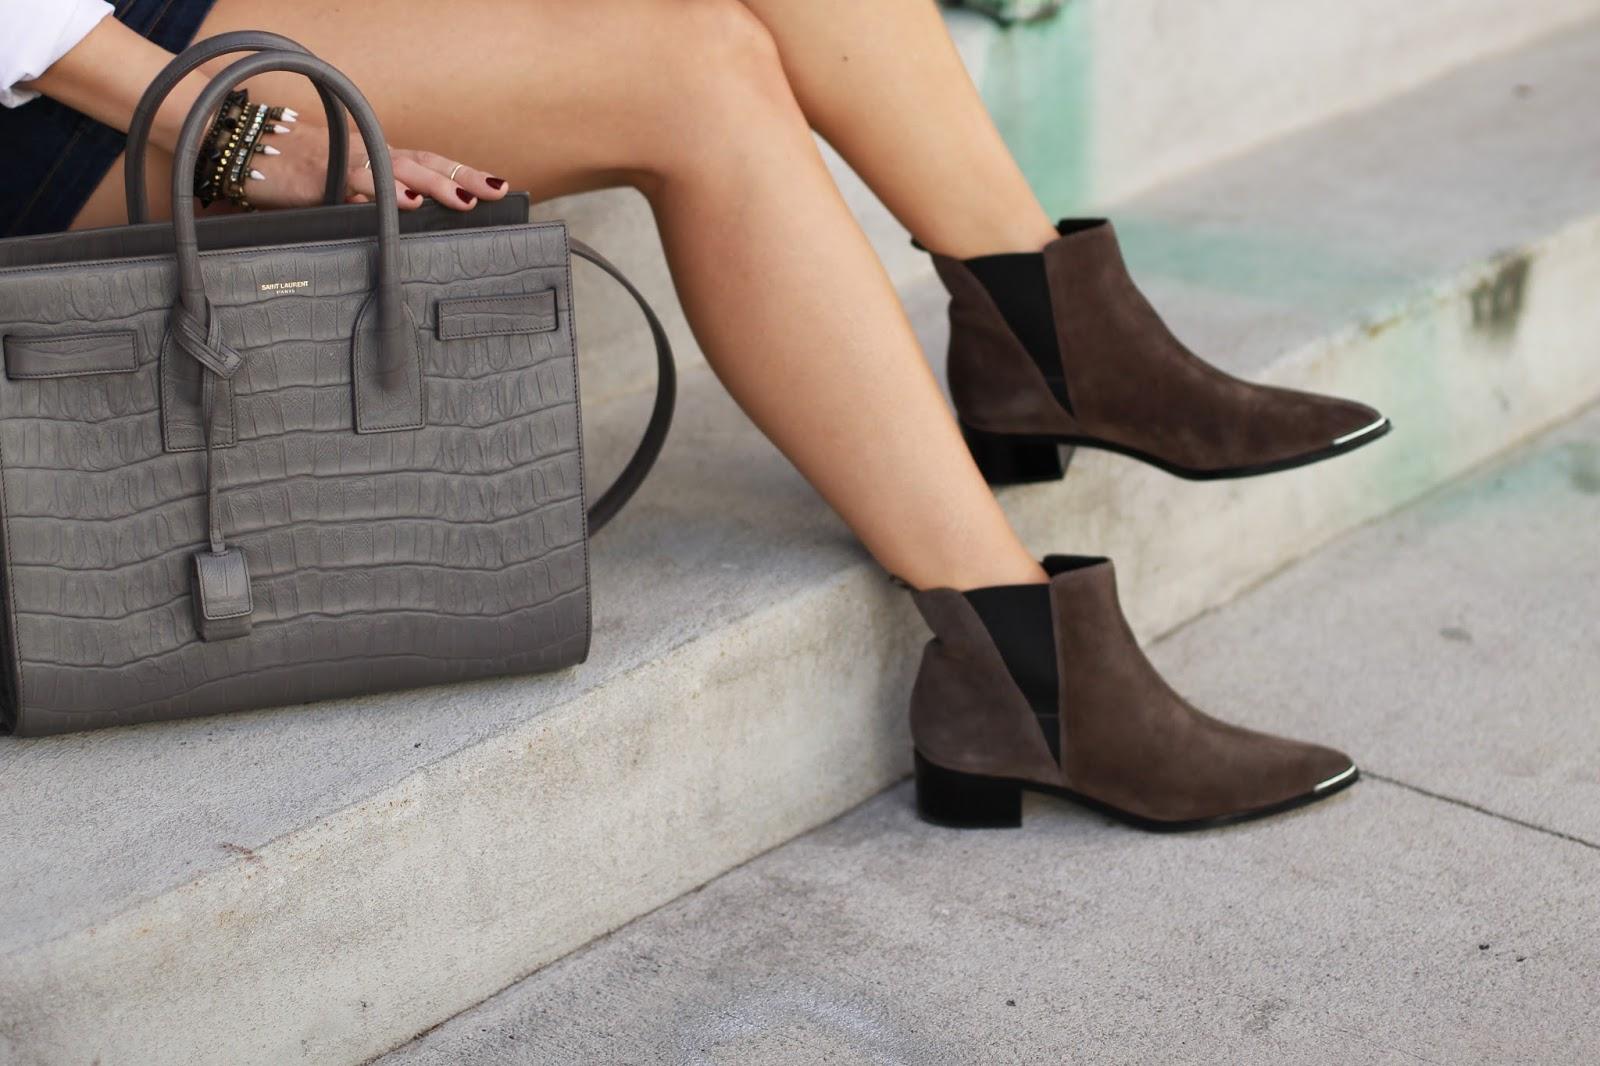 saint laurent croc bag, marc fisher yale boot, chelsea boot